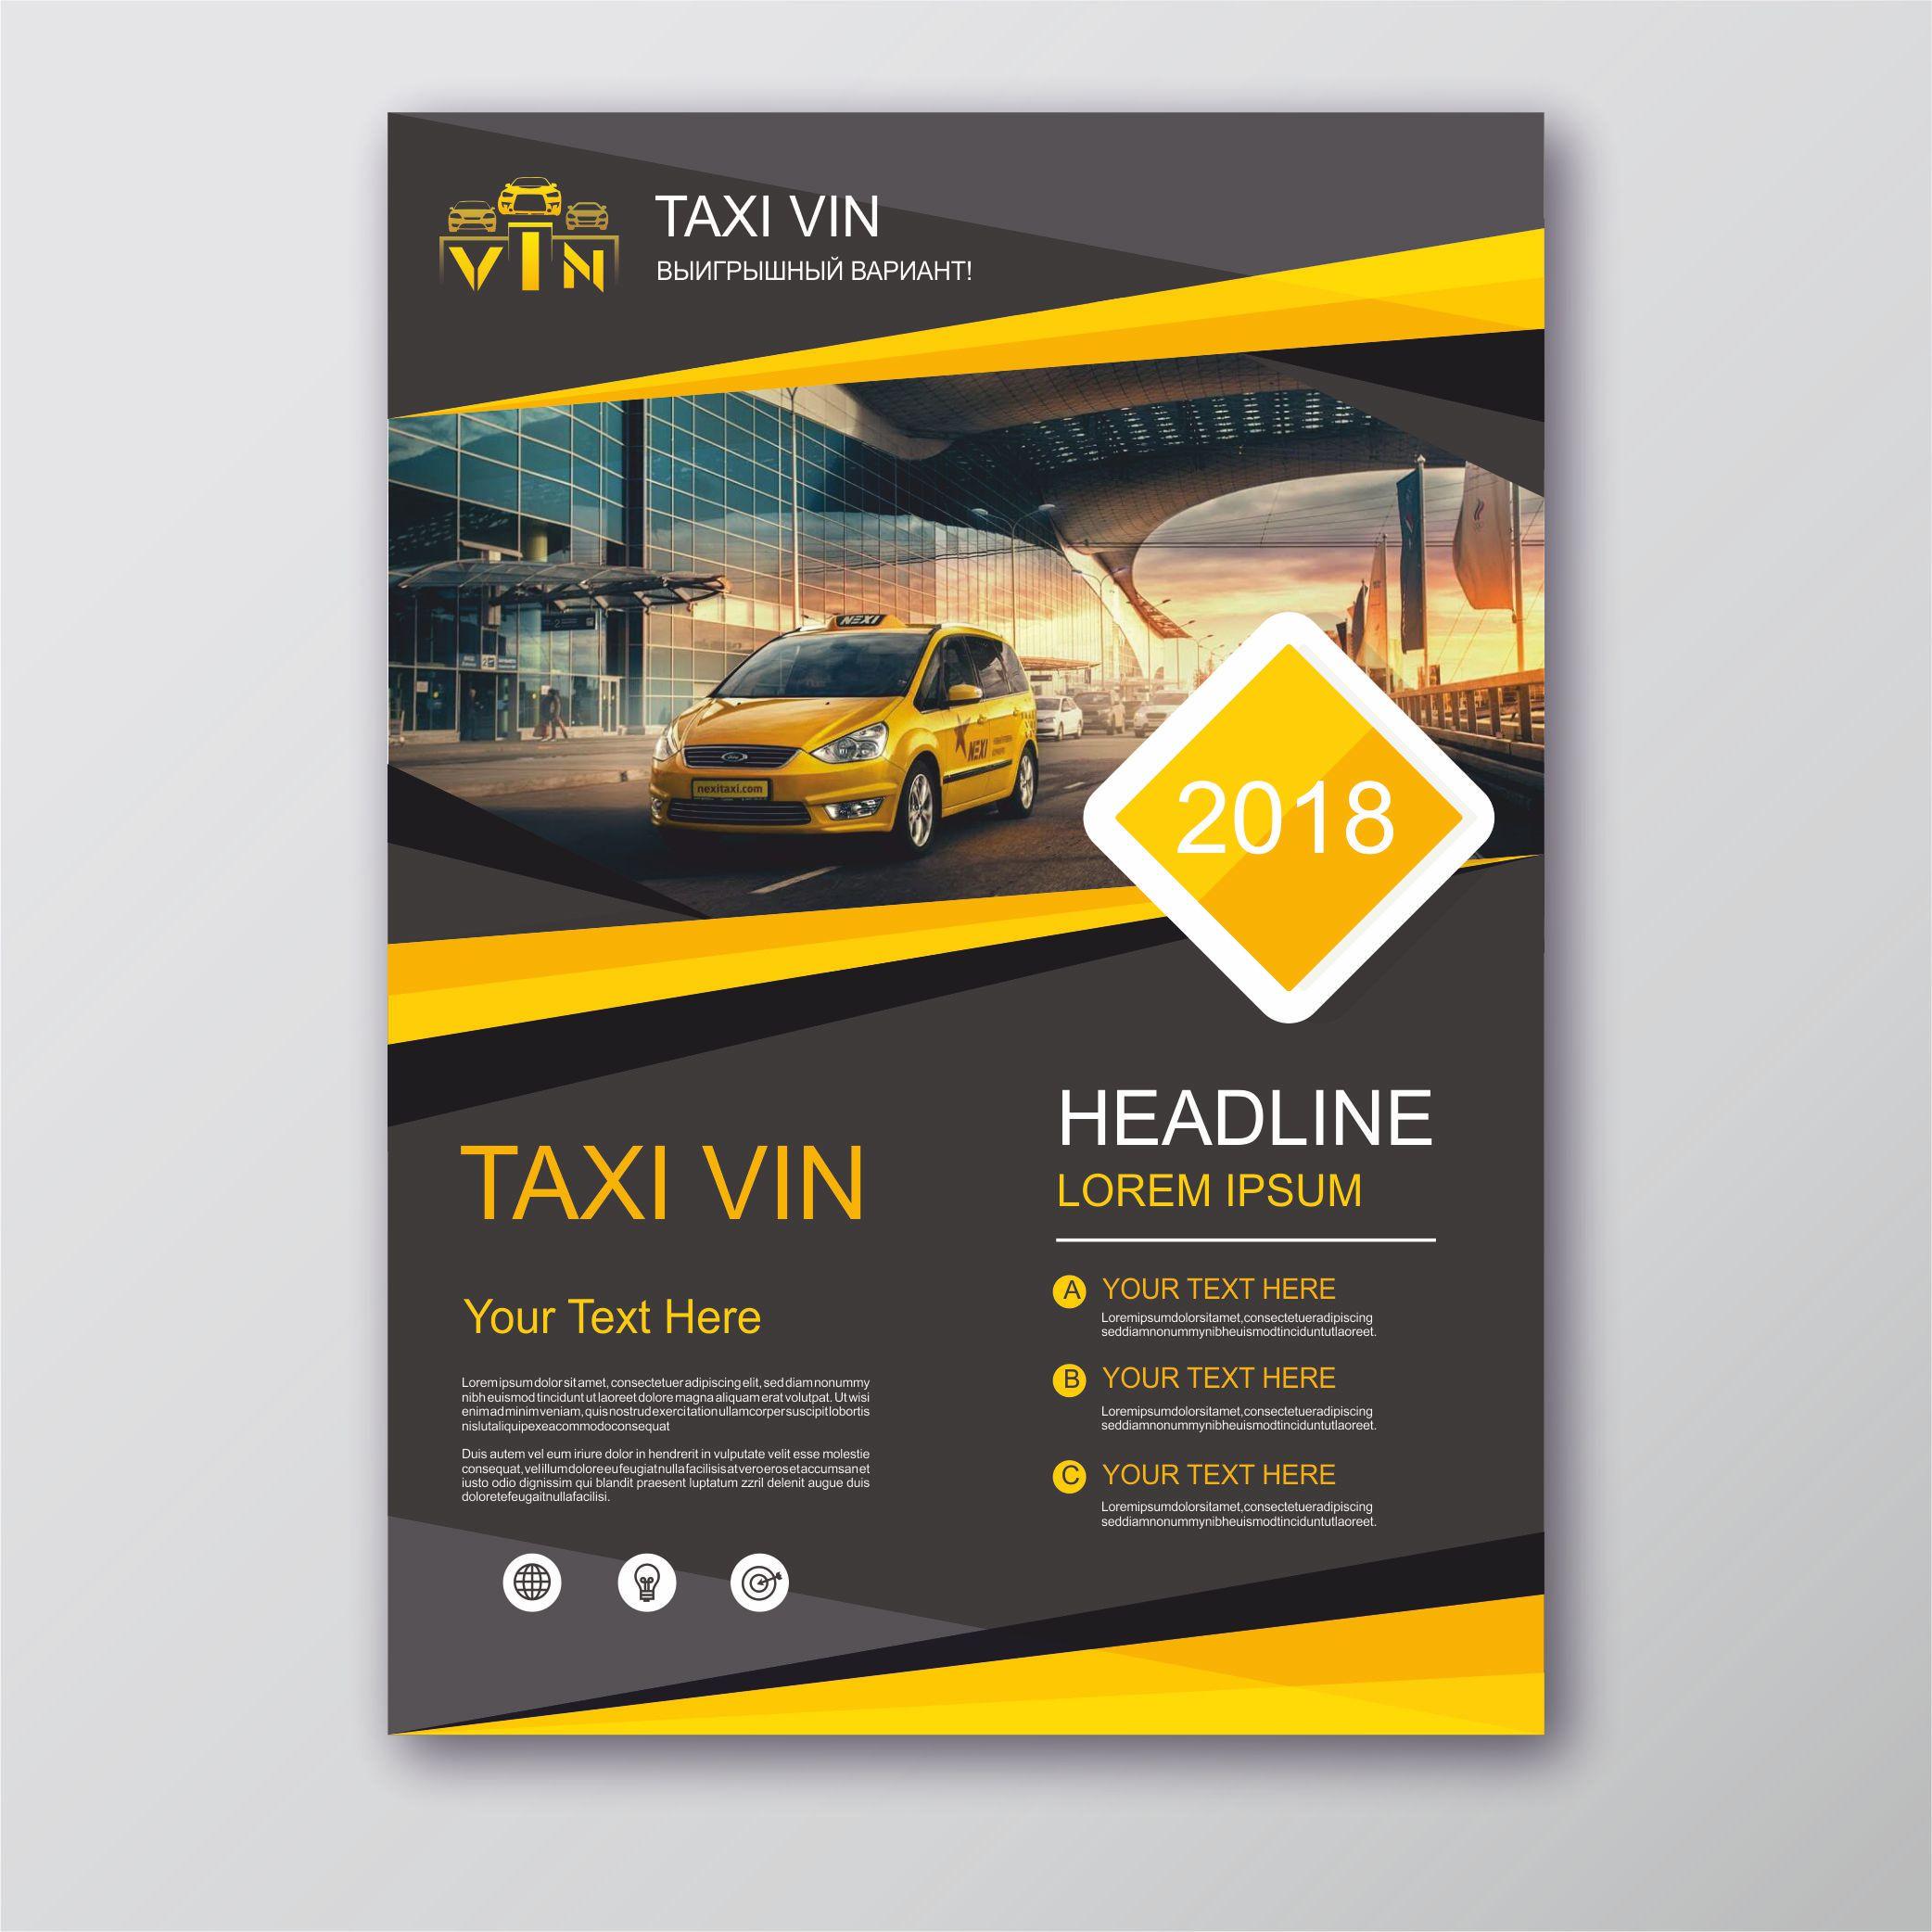 Разработка логотипа и фирменного стиля для такси фото f_8495b9ce34503b94.jpg